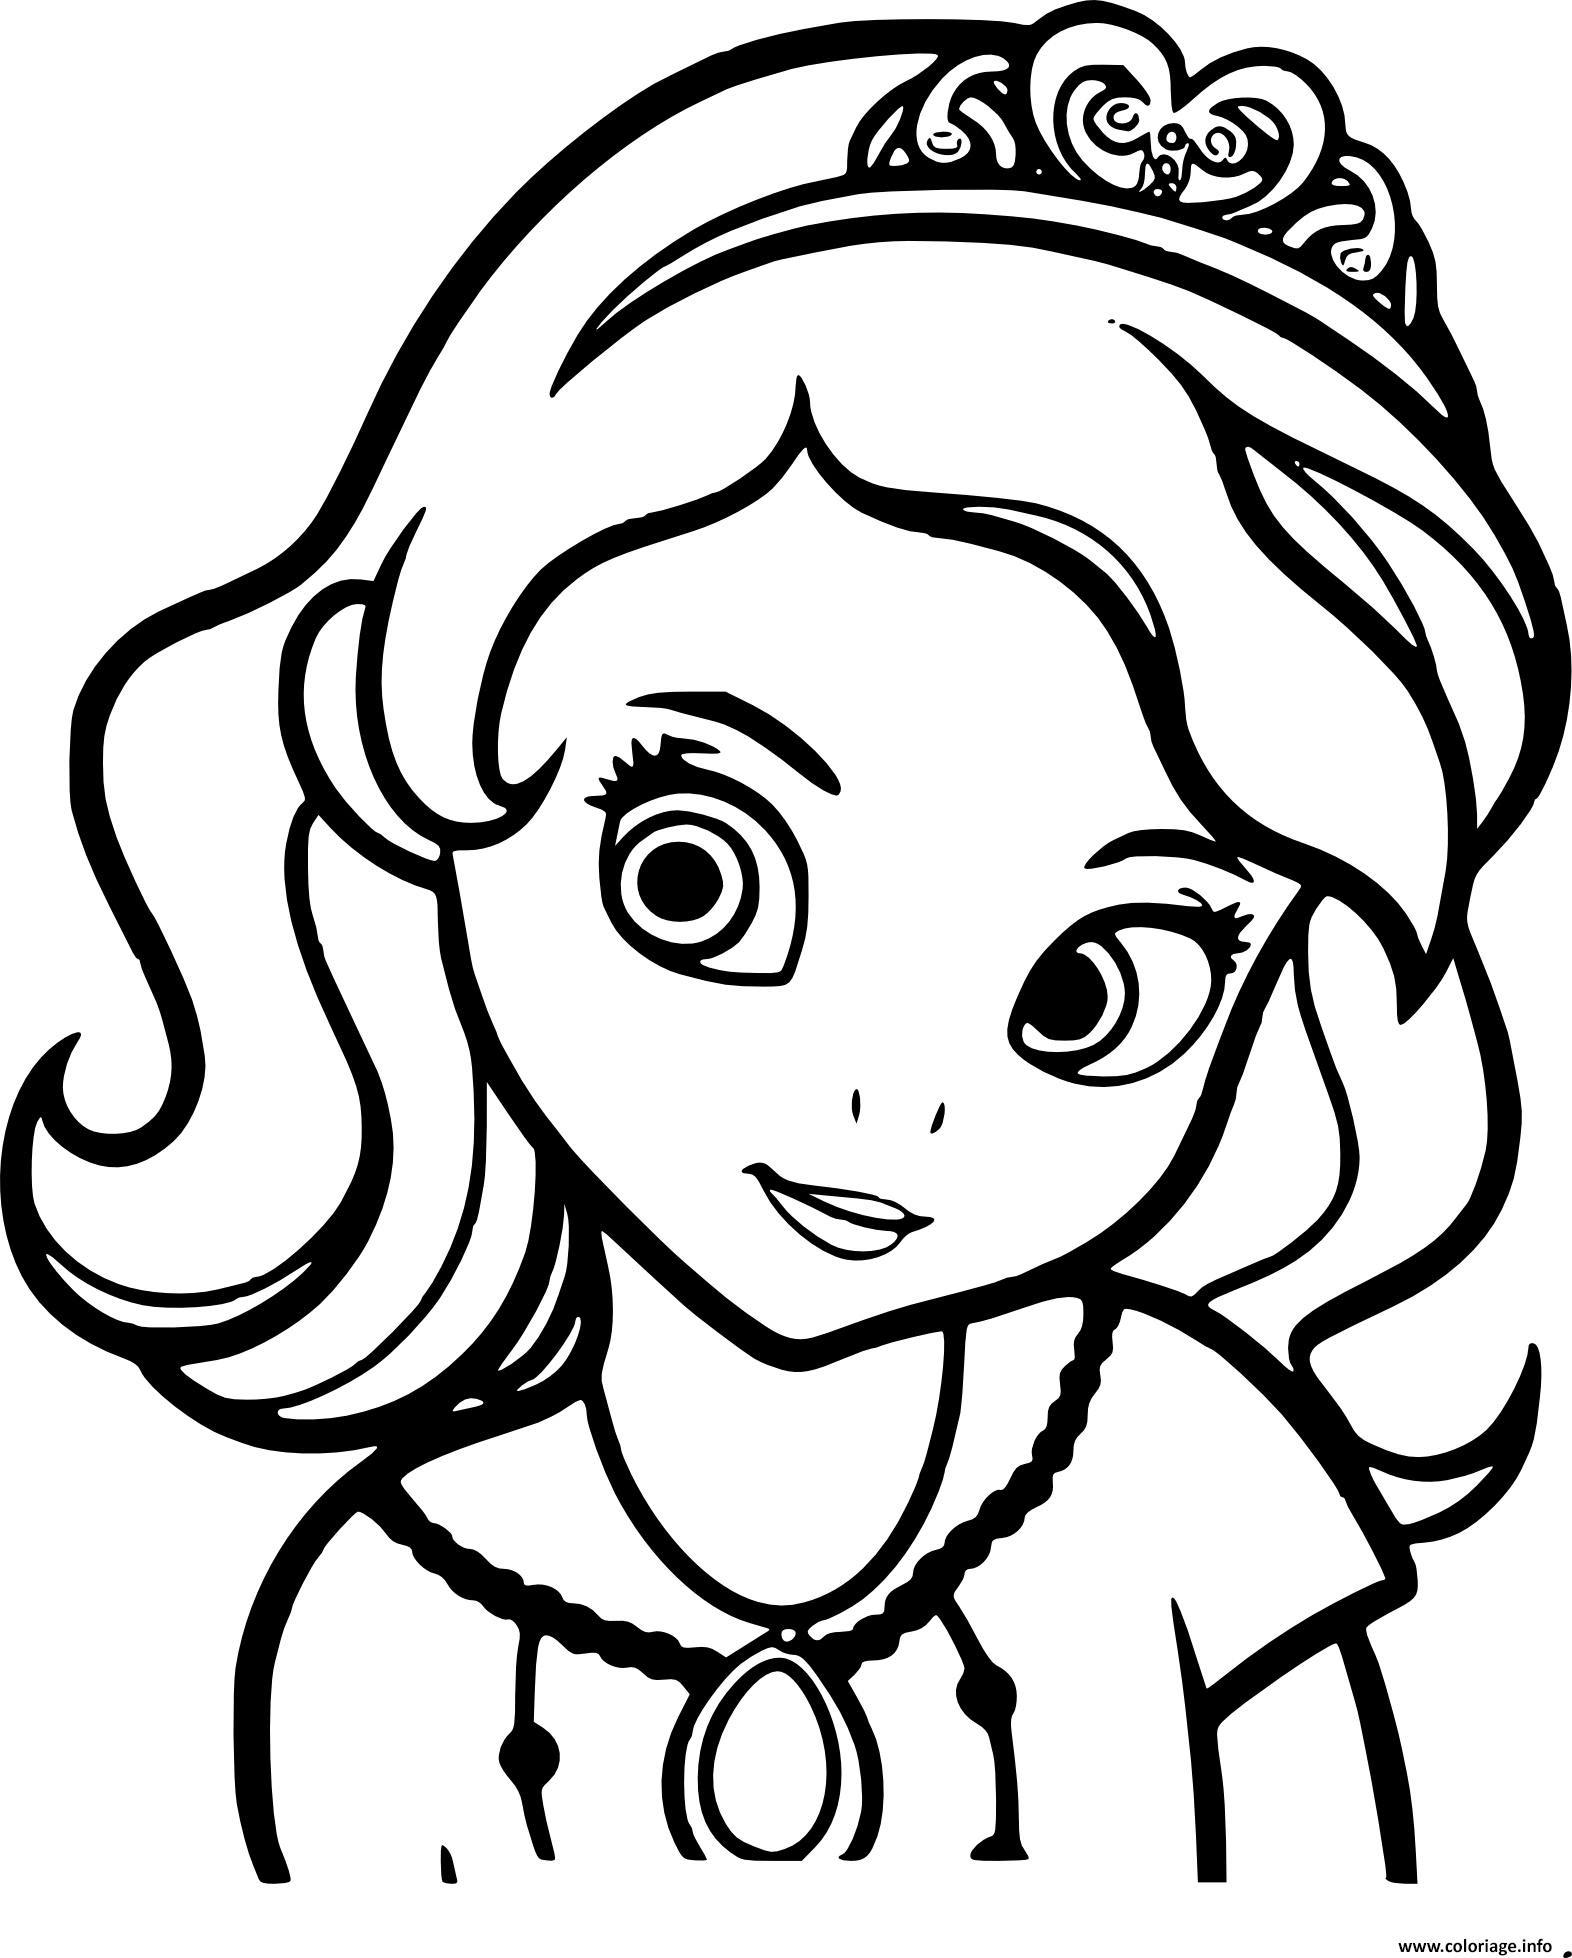 Coloriage Princesse Sofia De Face Portrait Visage Dessin  Imprimer